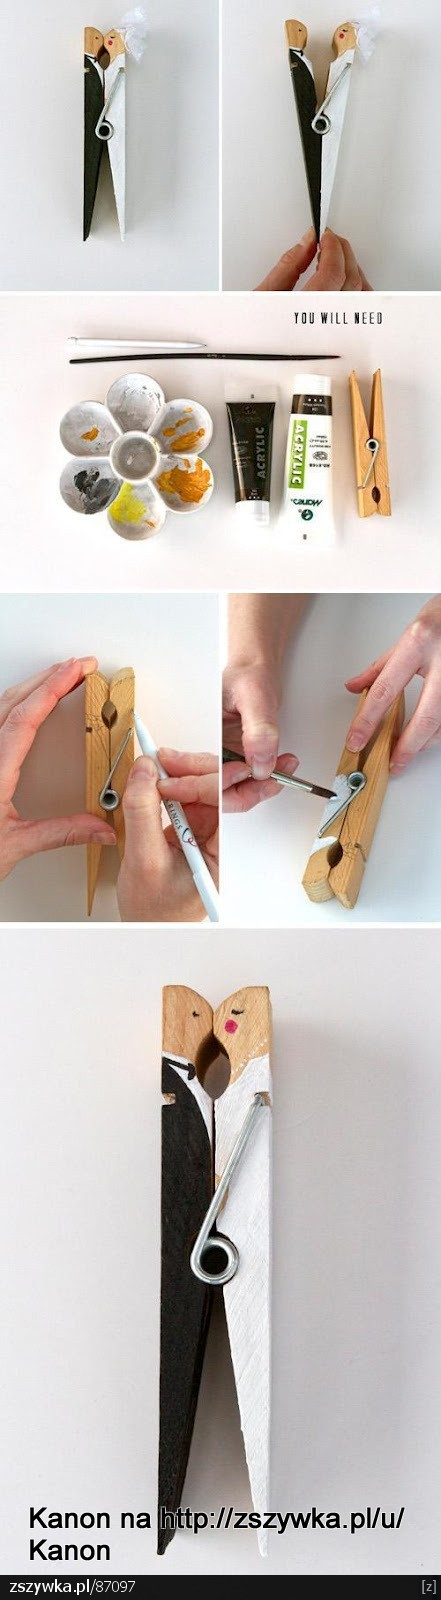 Craft wedding Place card holder idea